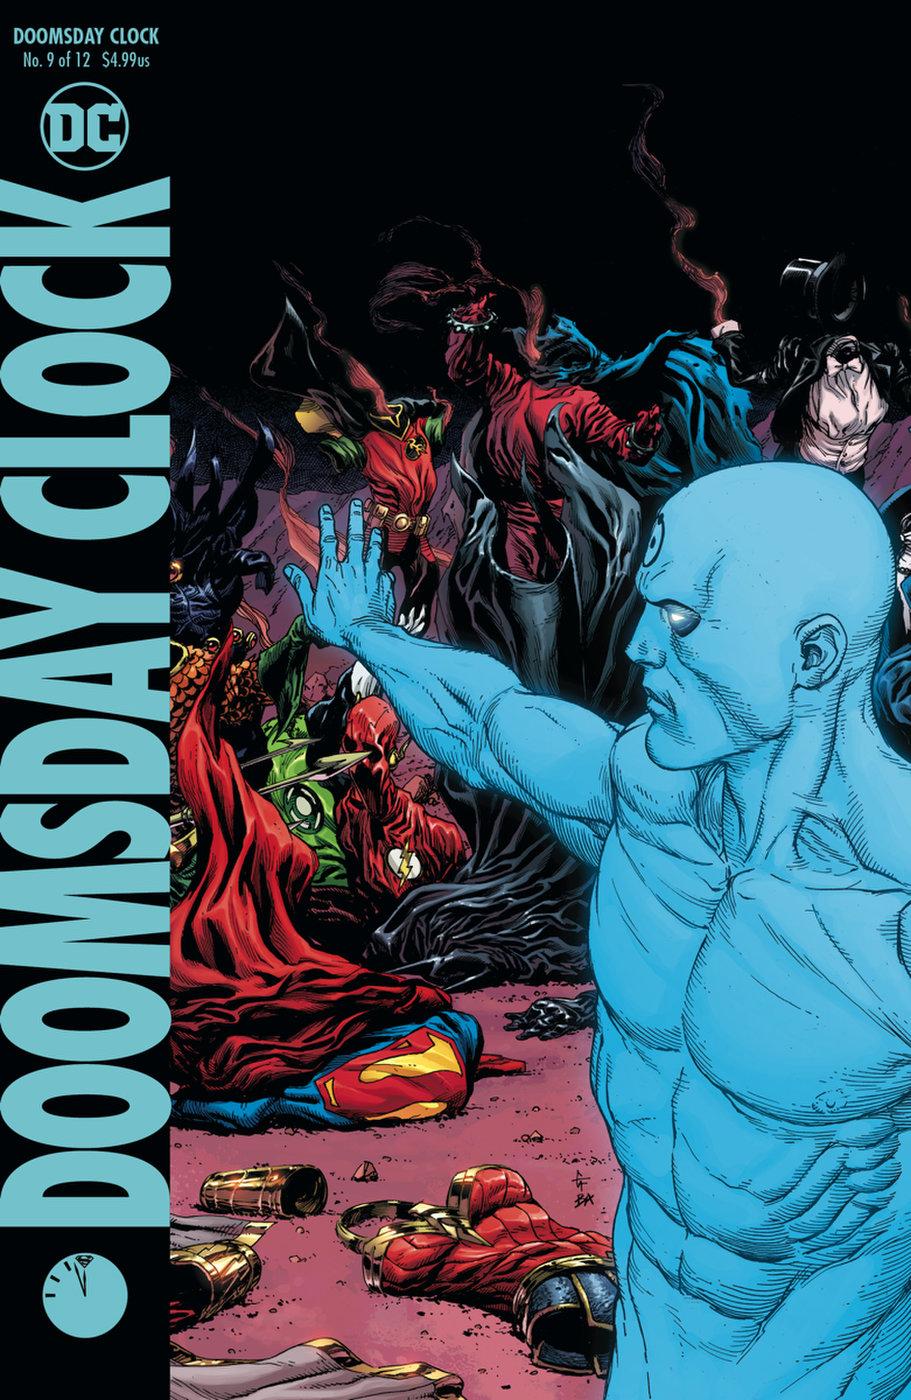 Doomsday Clock 9